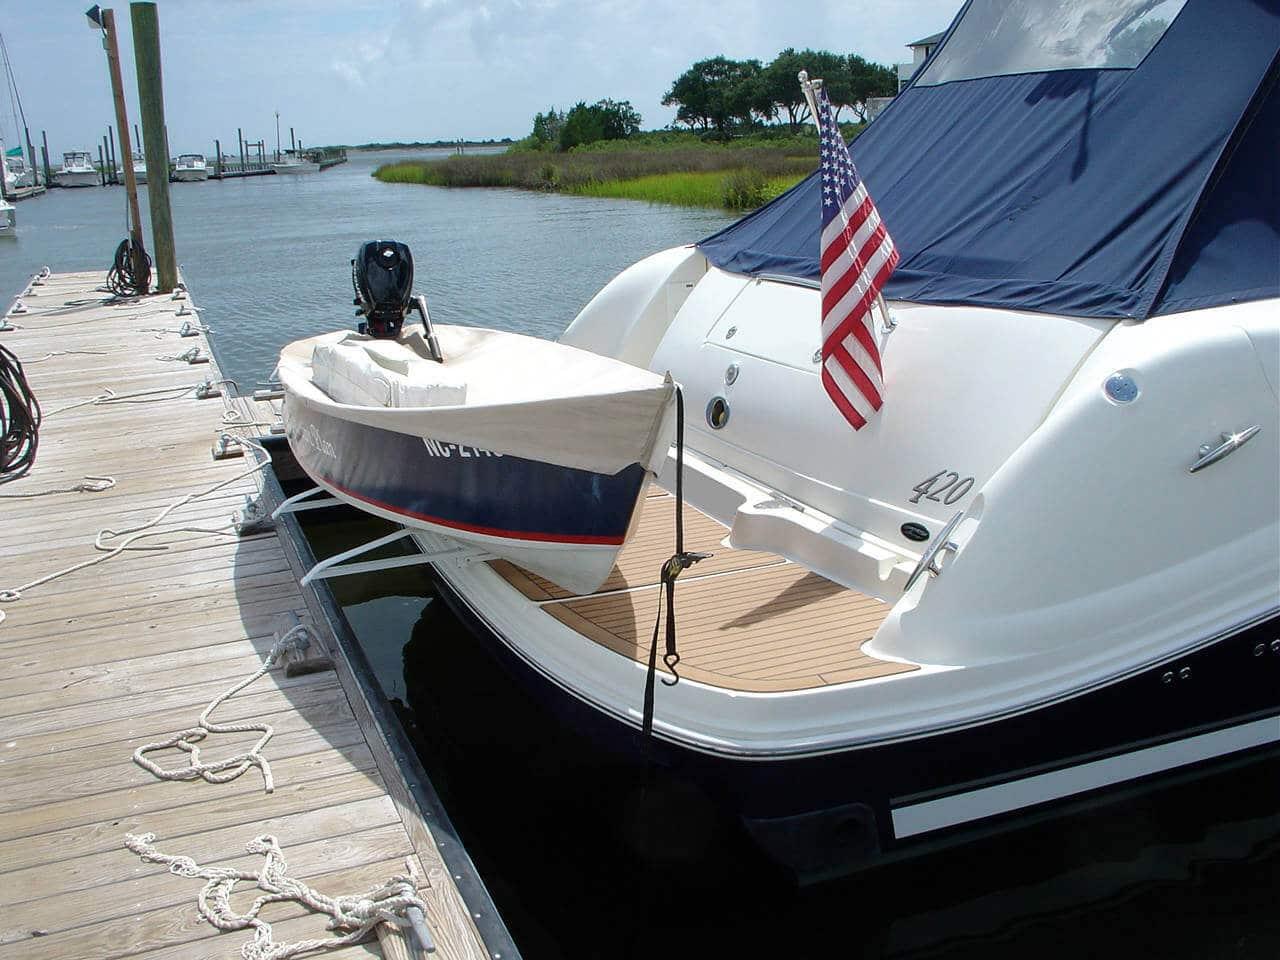 42 39 Searay Boat With Hurley Dinghy Davit Hurley Marine